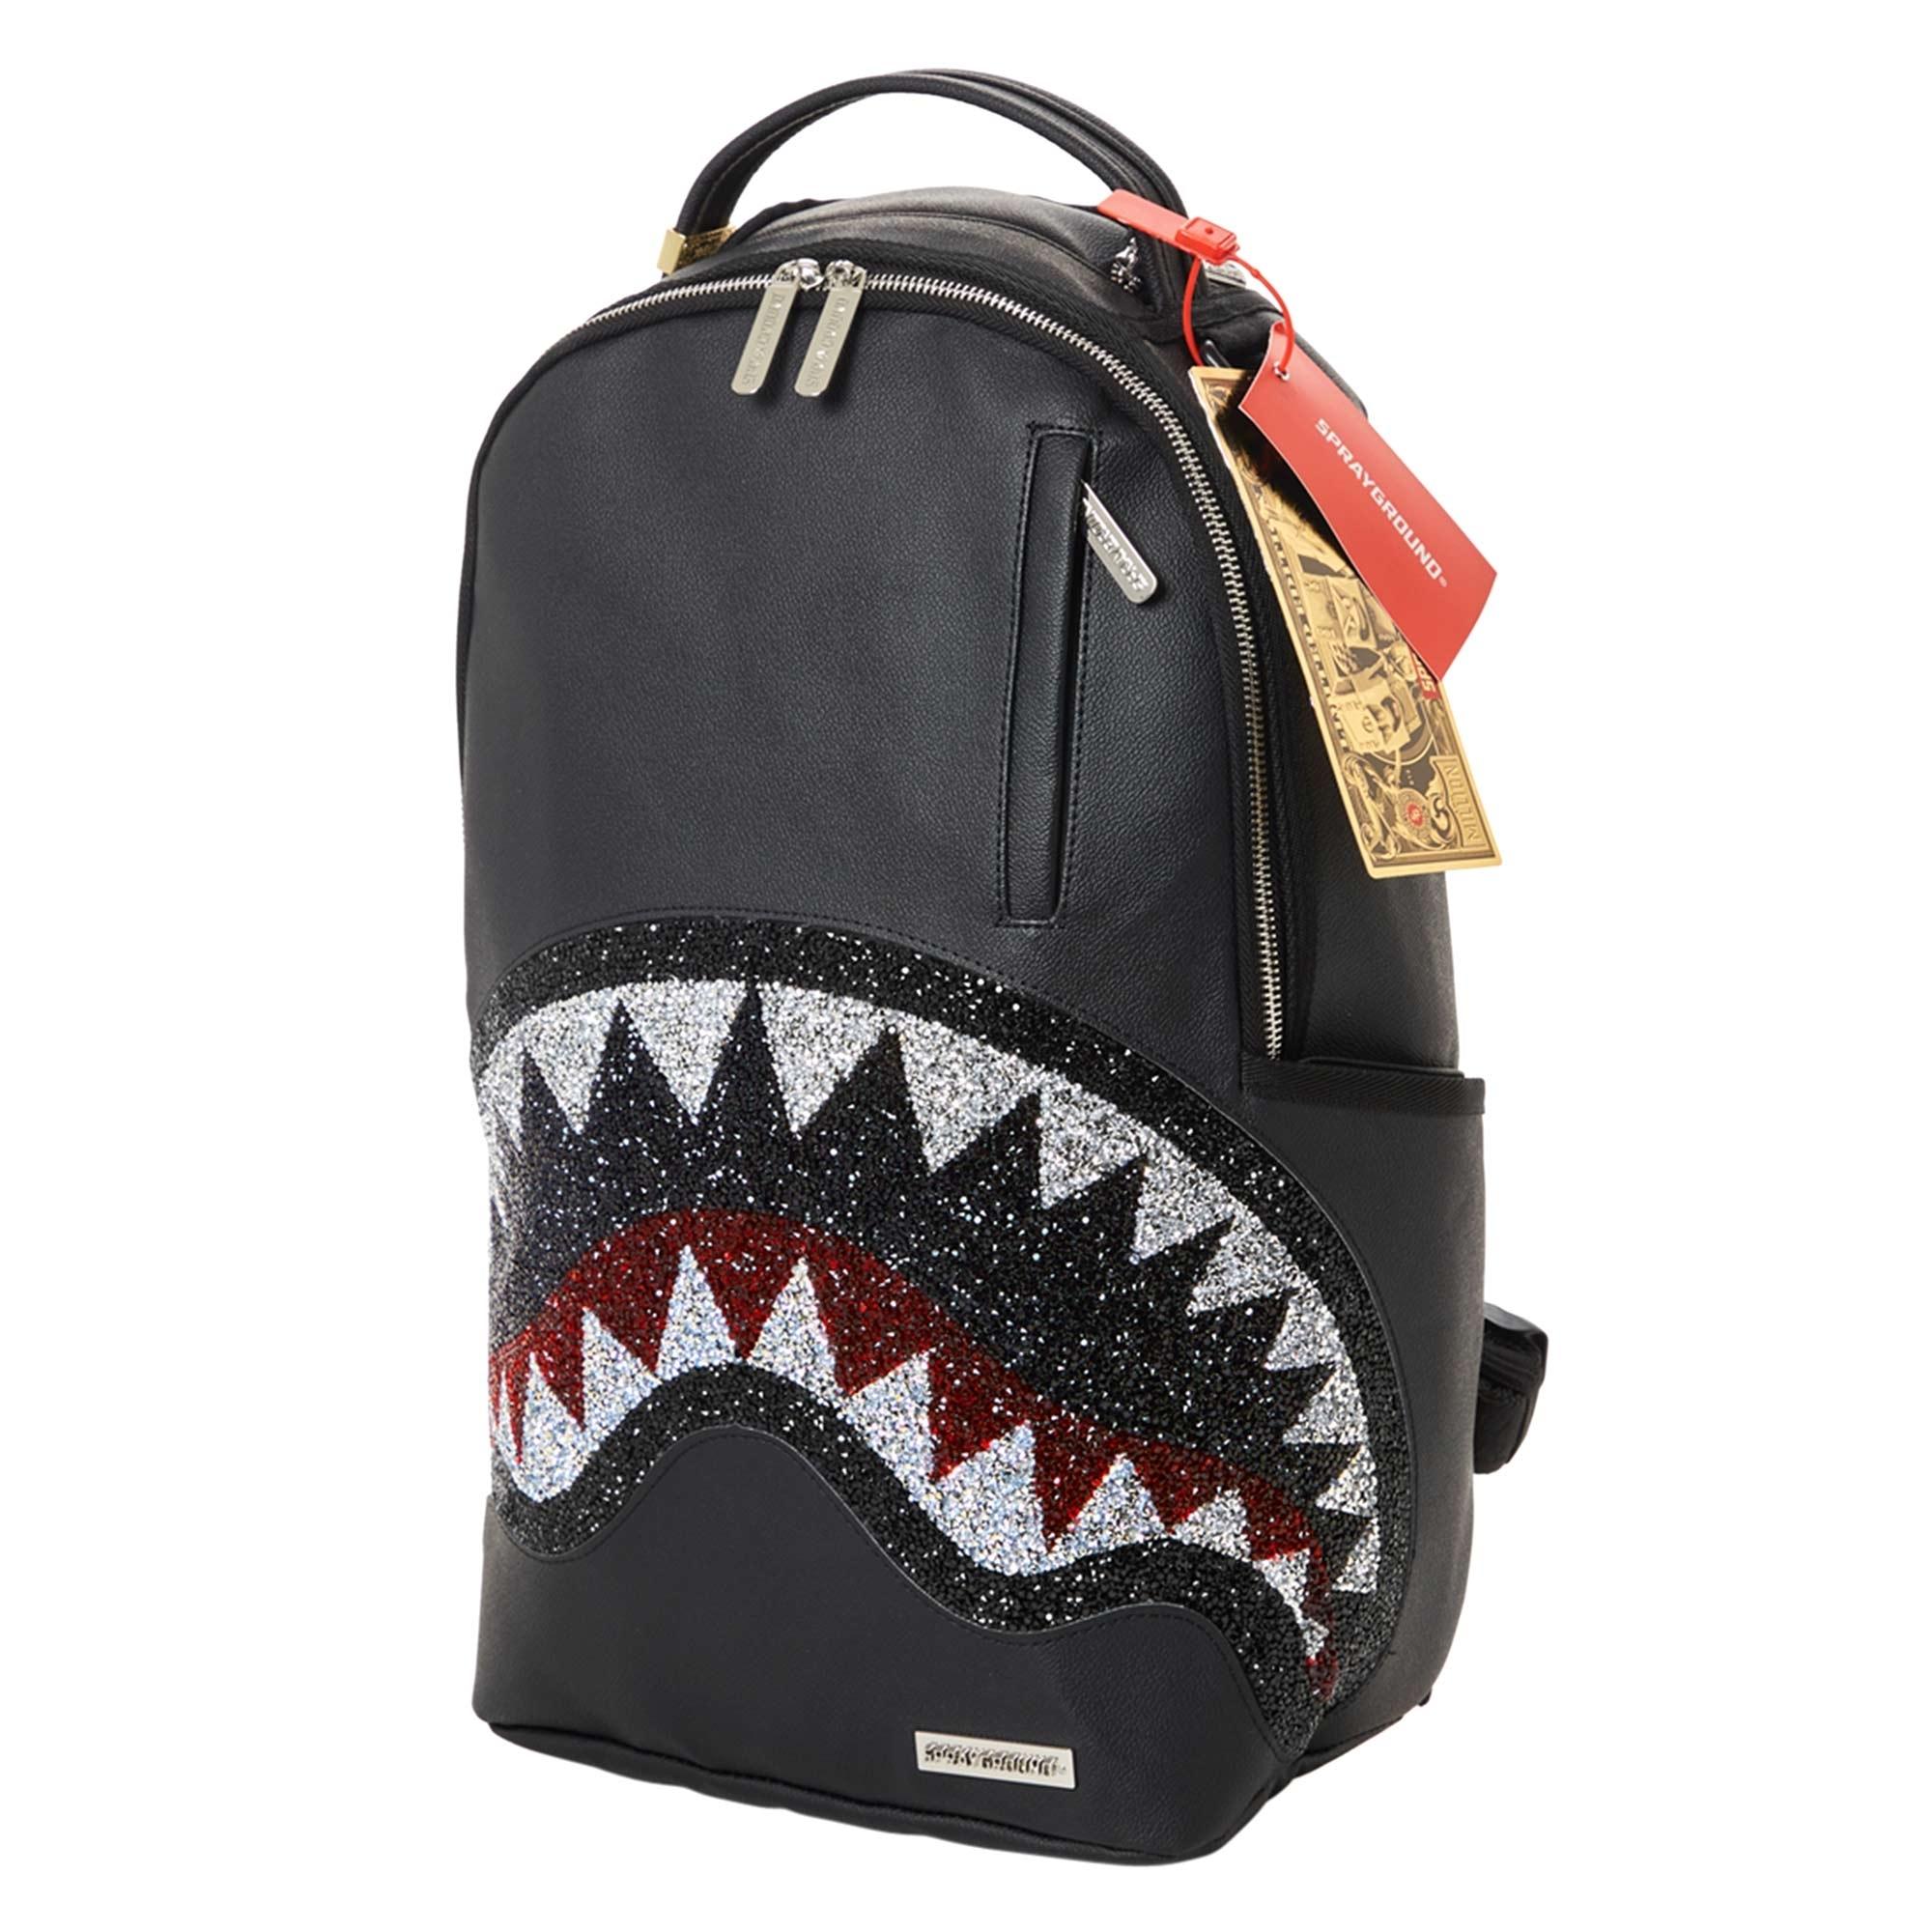 clearcut-dlx-backpack-black-p49225-623719_image.jpg